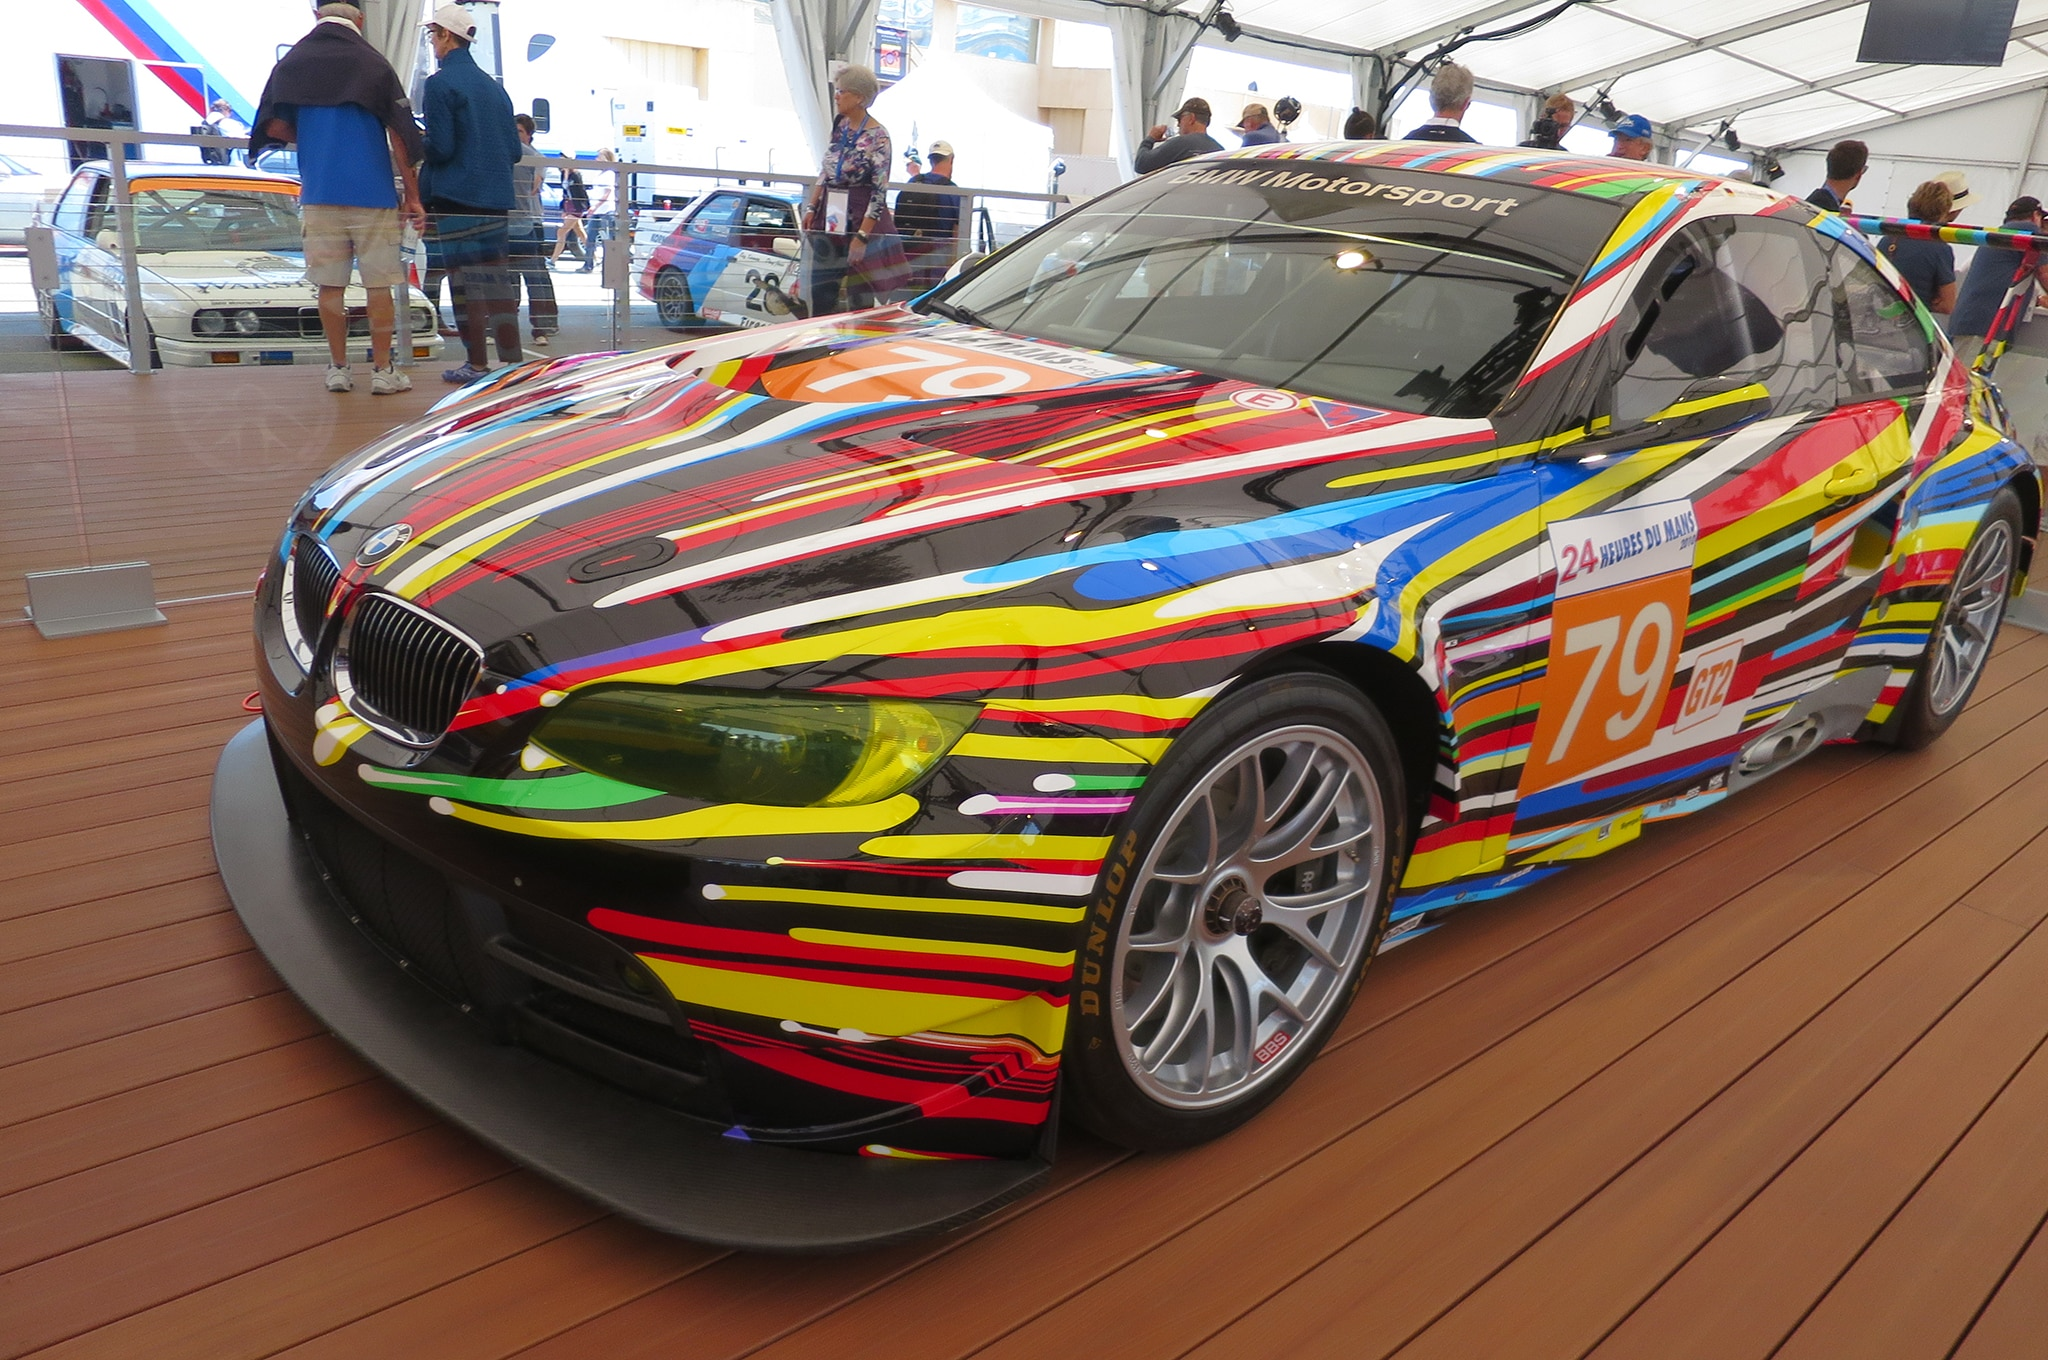 2010 BMW M3 GT2 Art Car Jeff Koons front three quarter